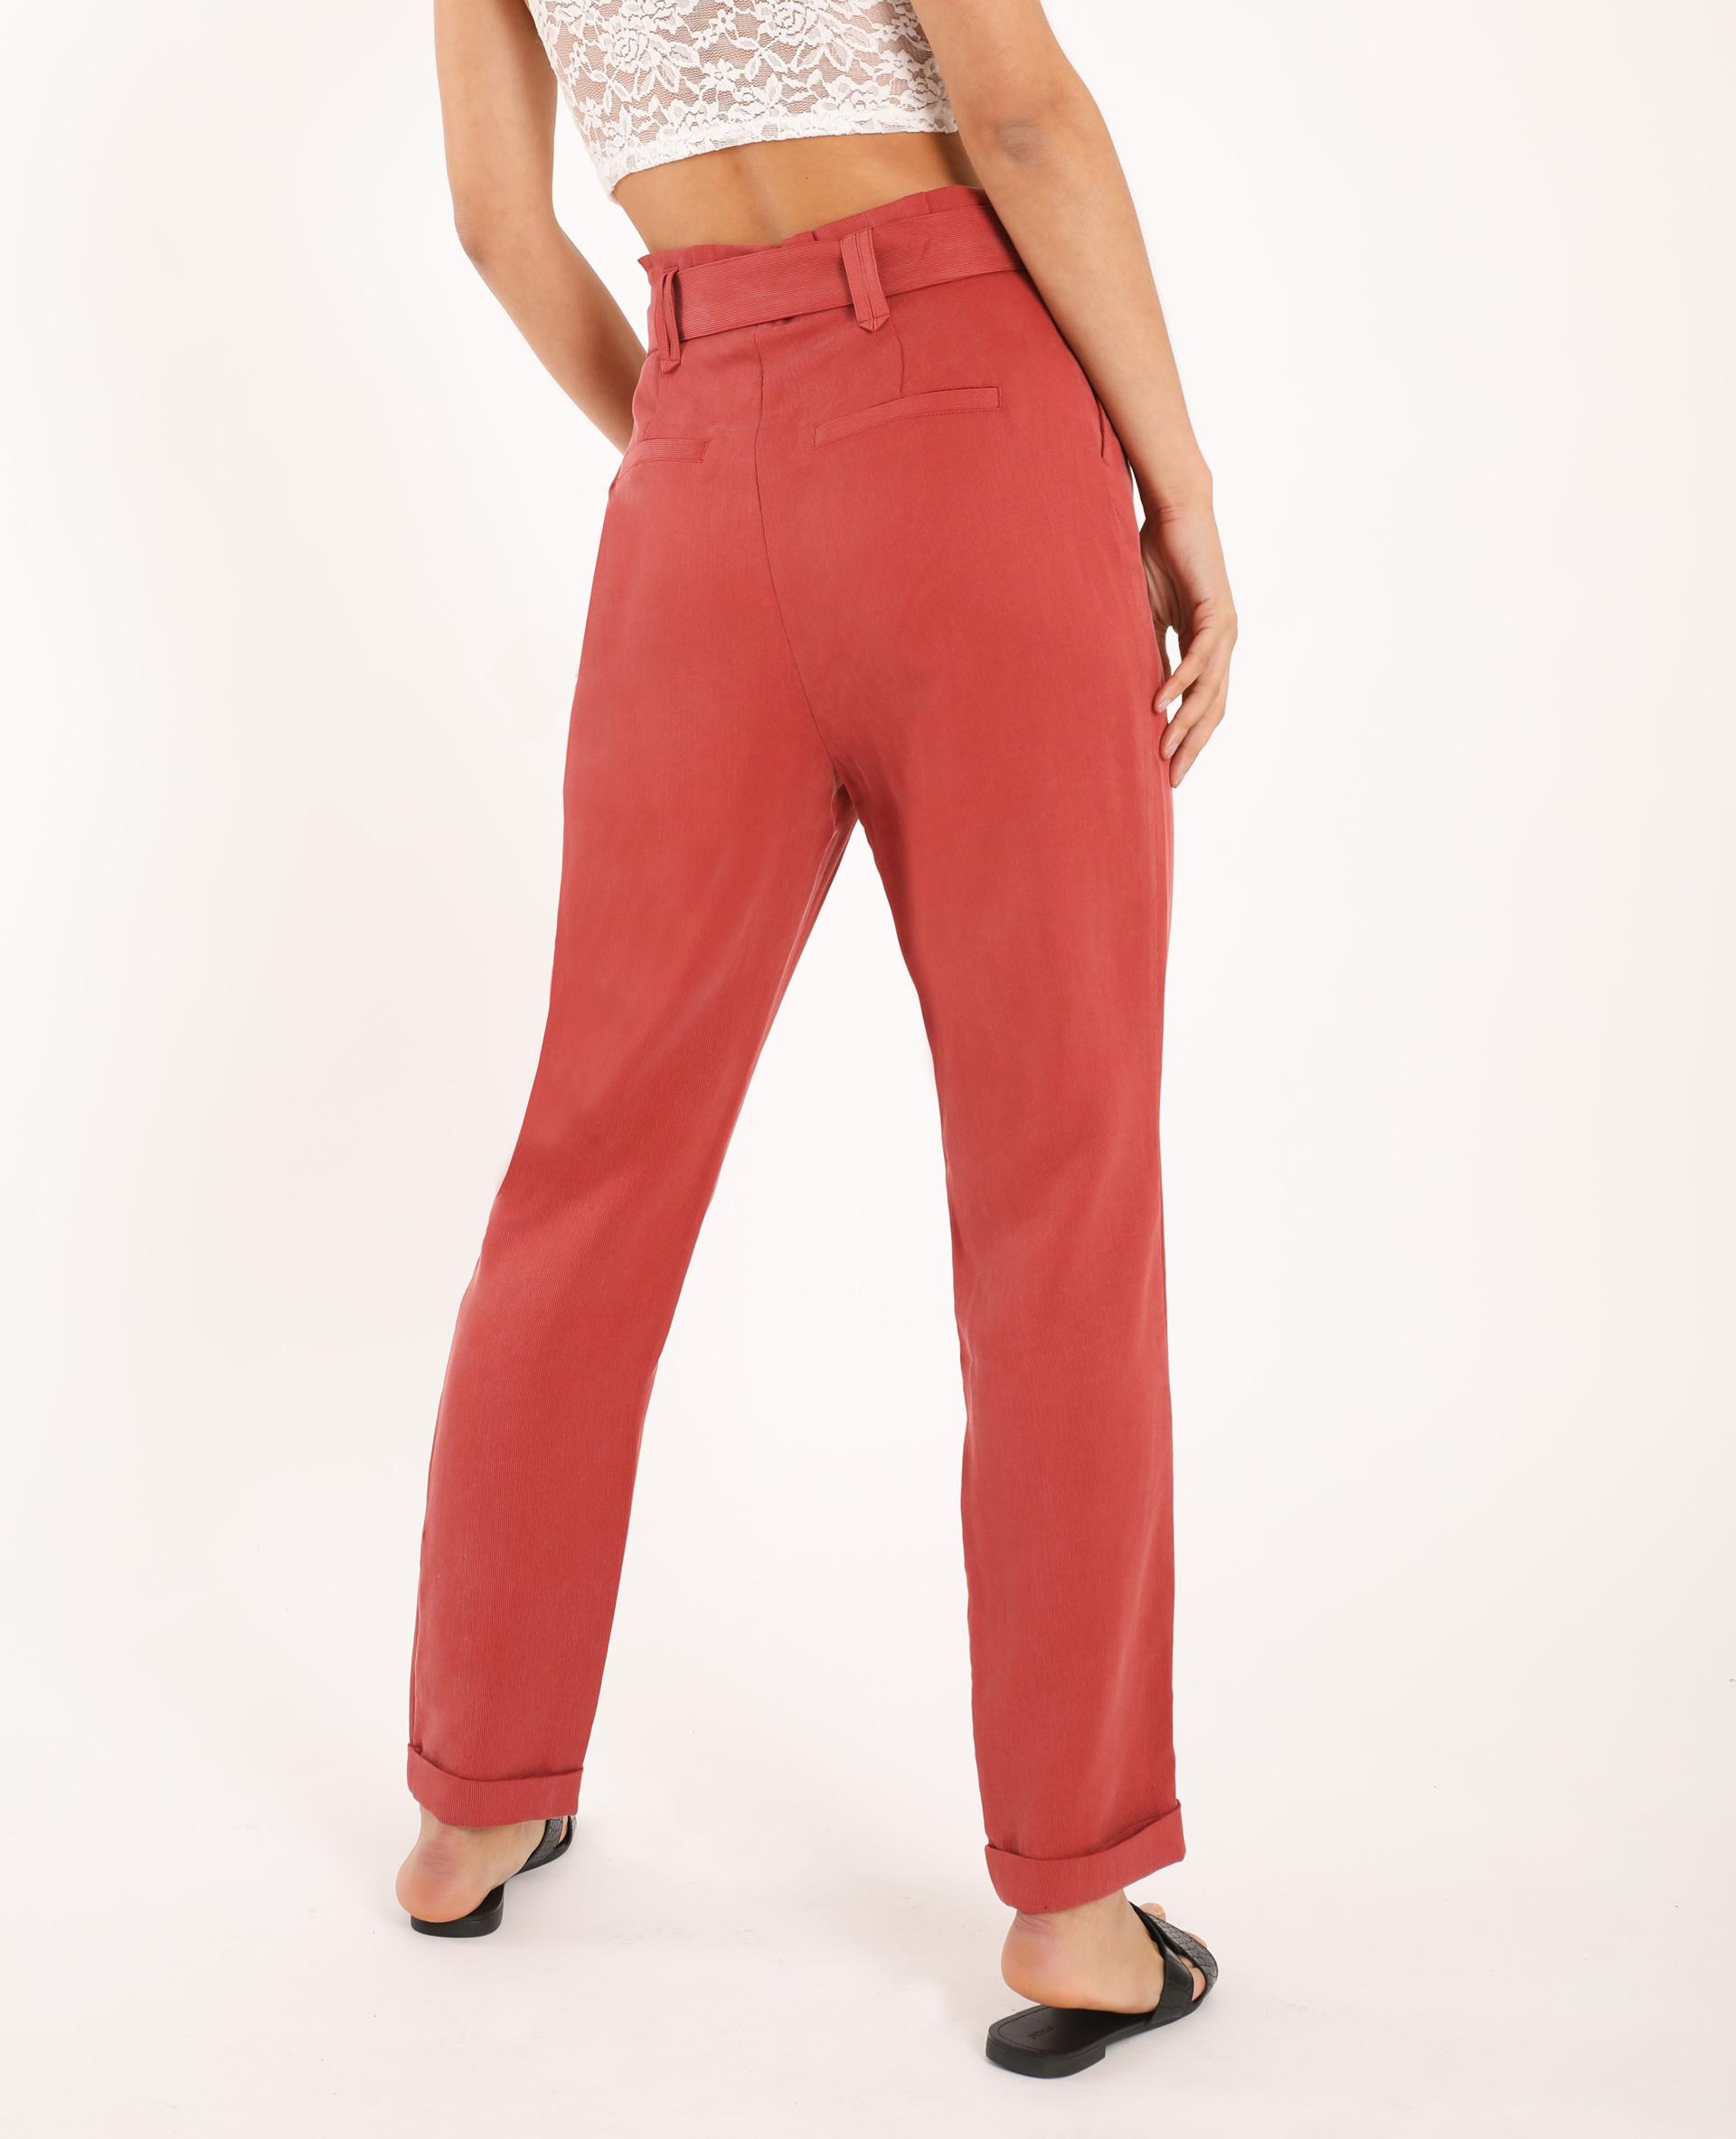 Pantalon carotte rose - Pimkie